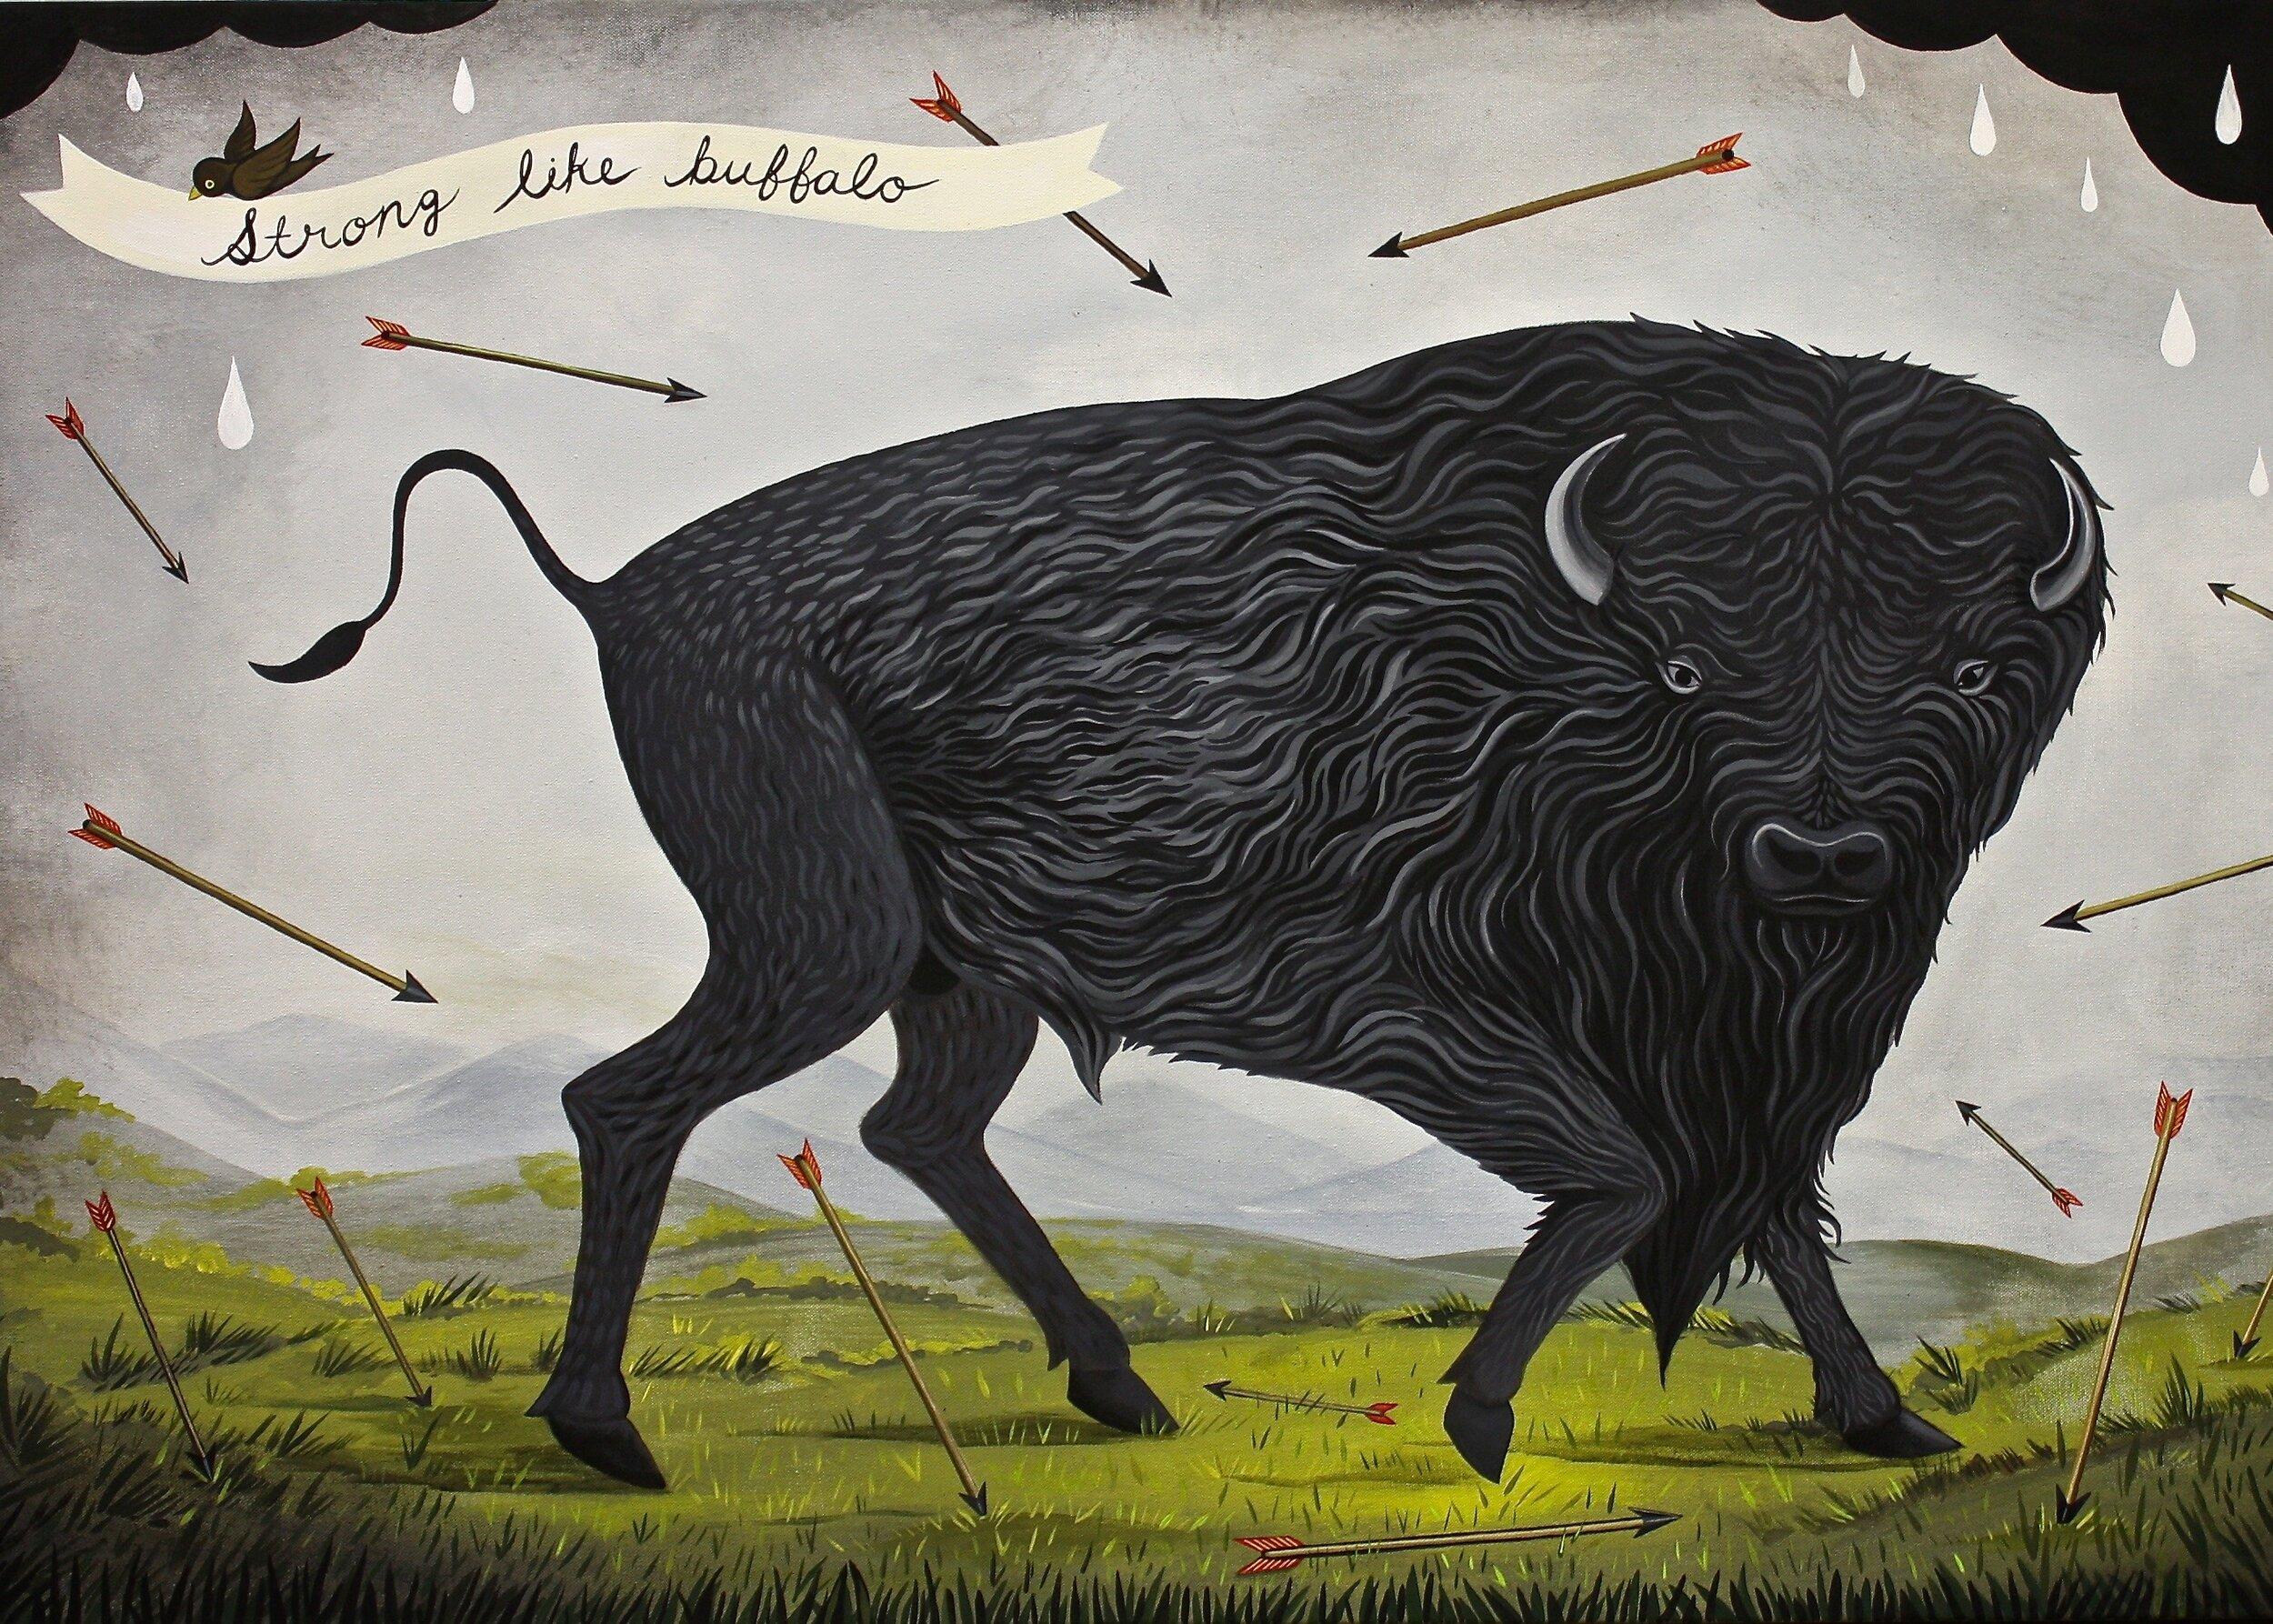 Strong Like Buffalo